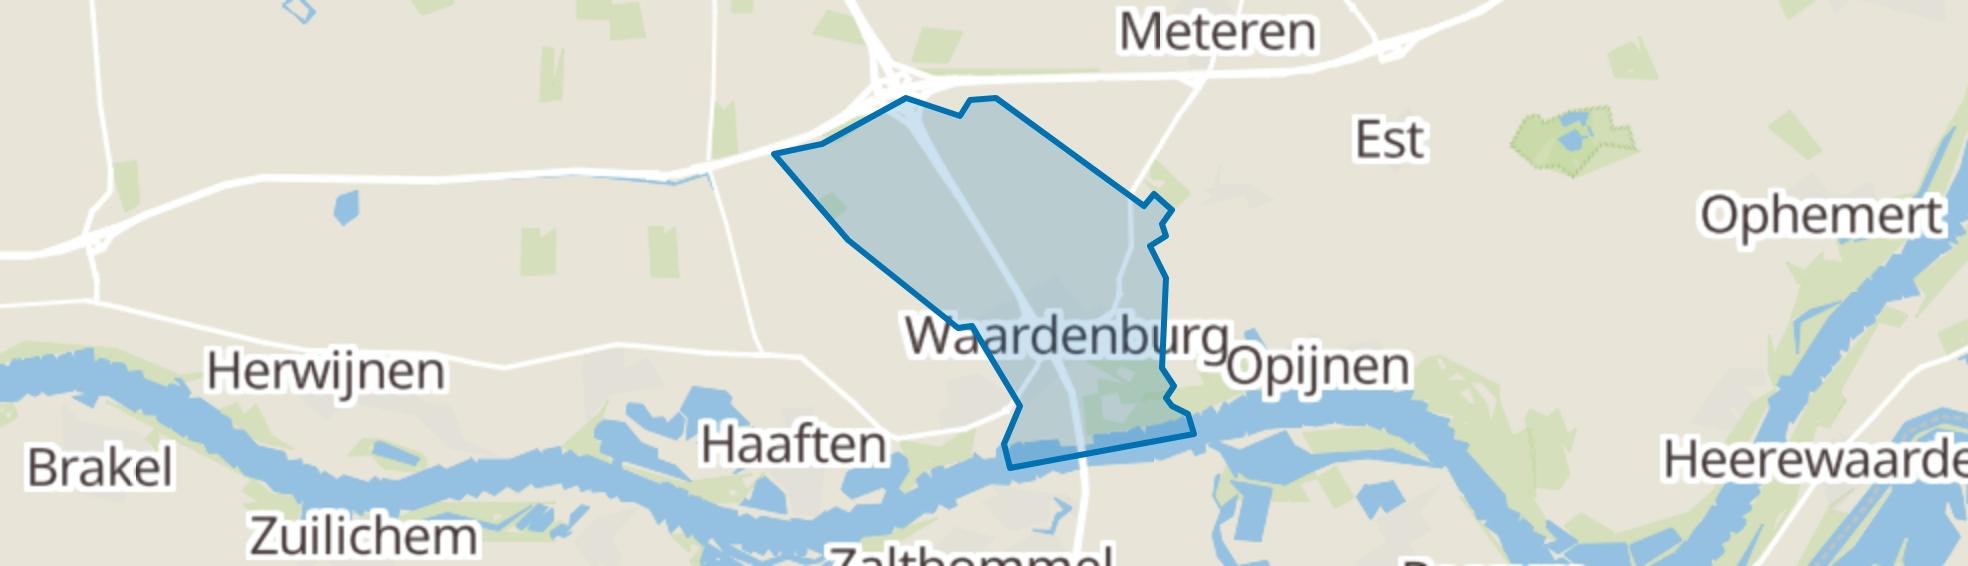 Waardenburg map